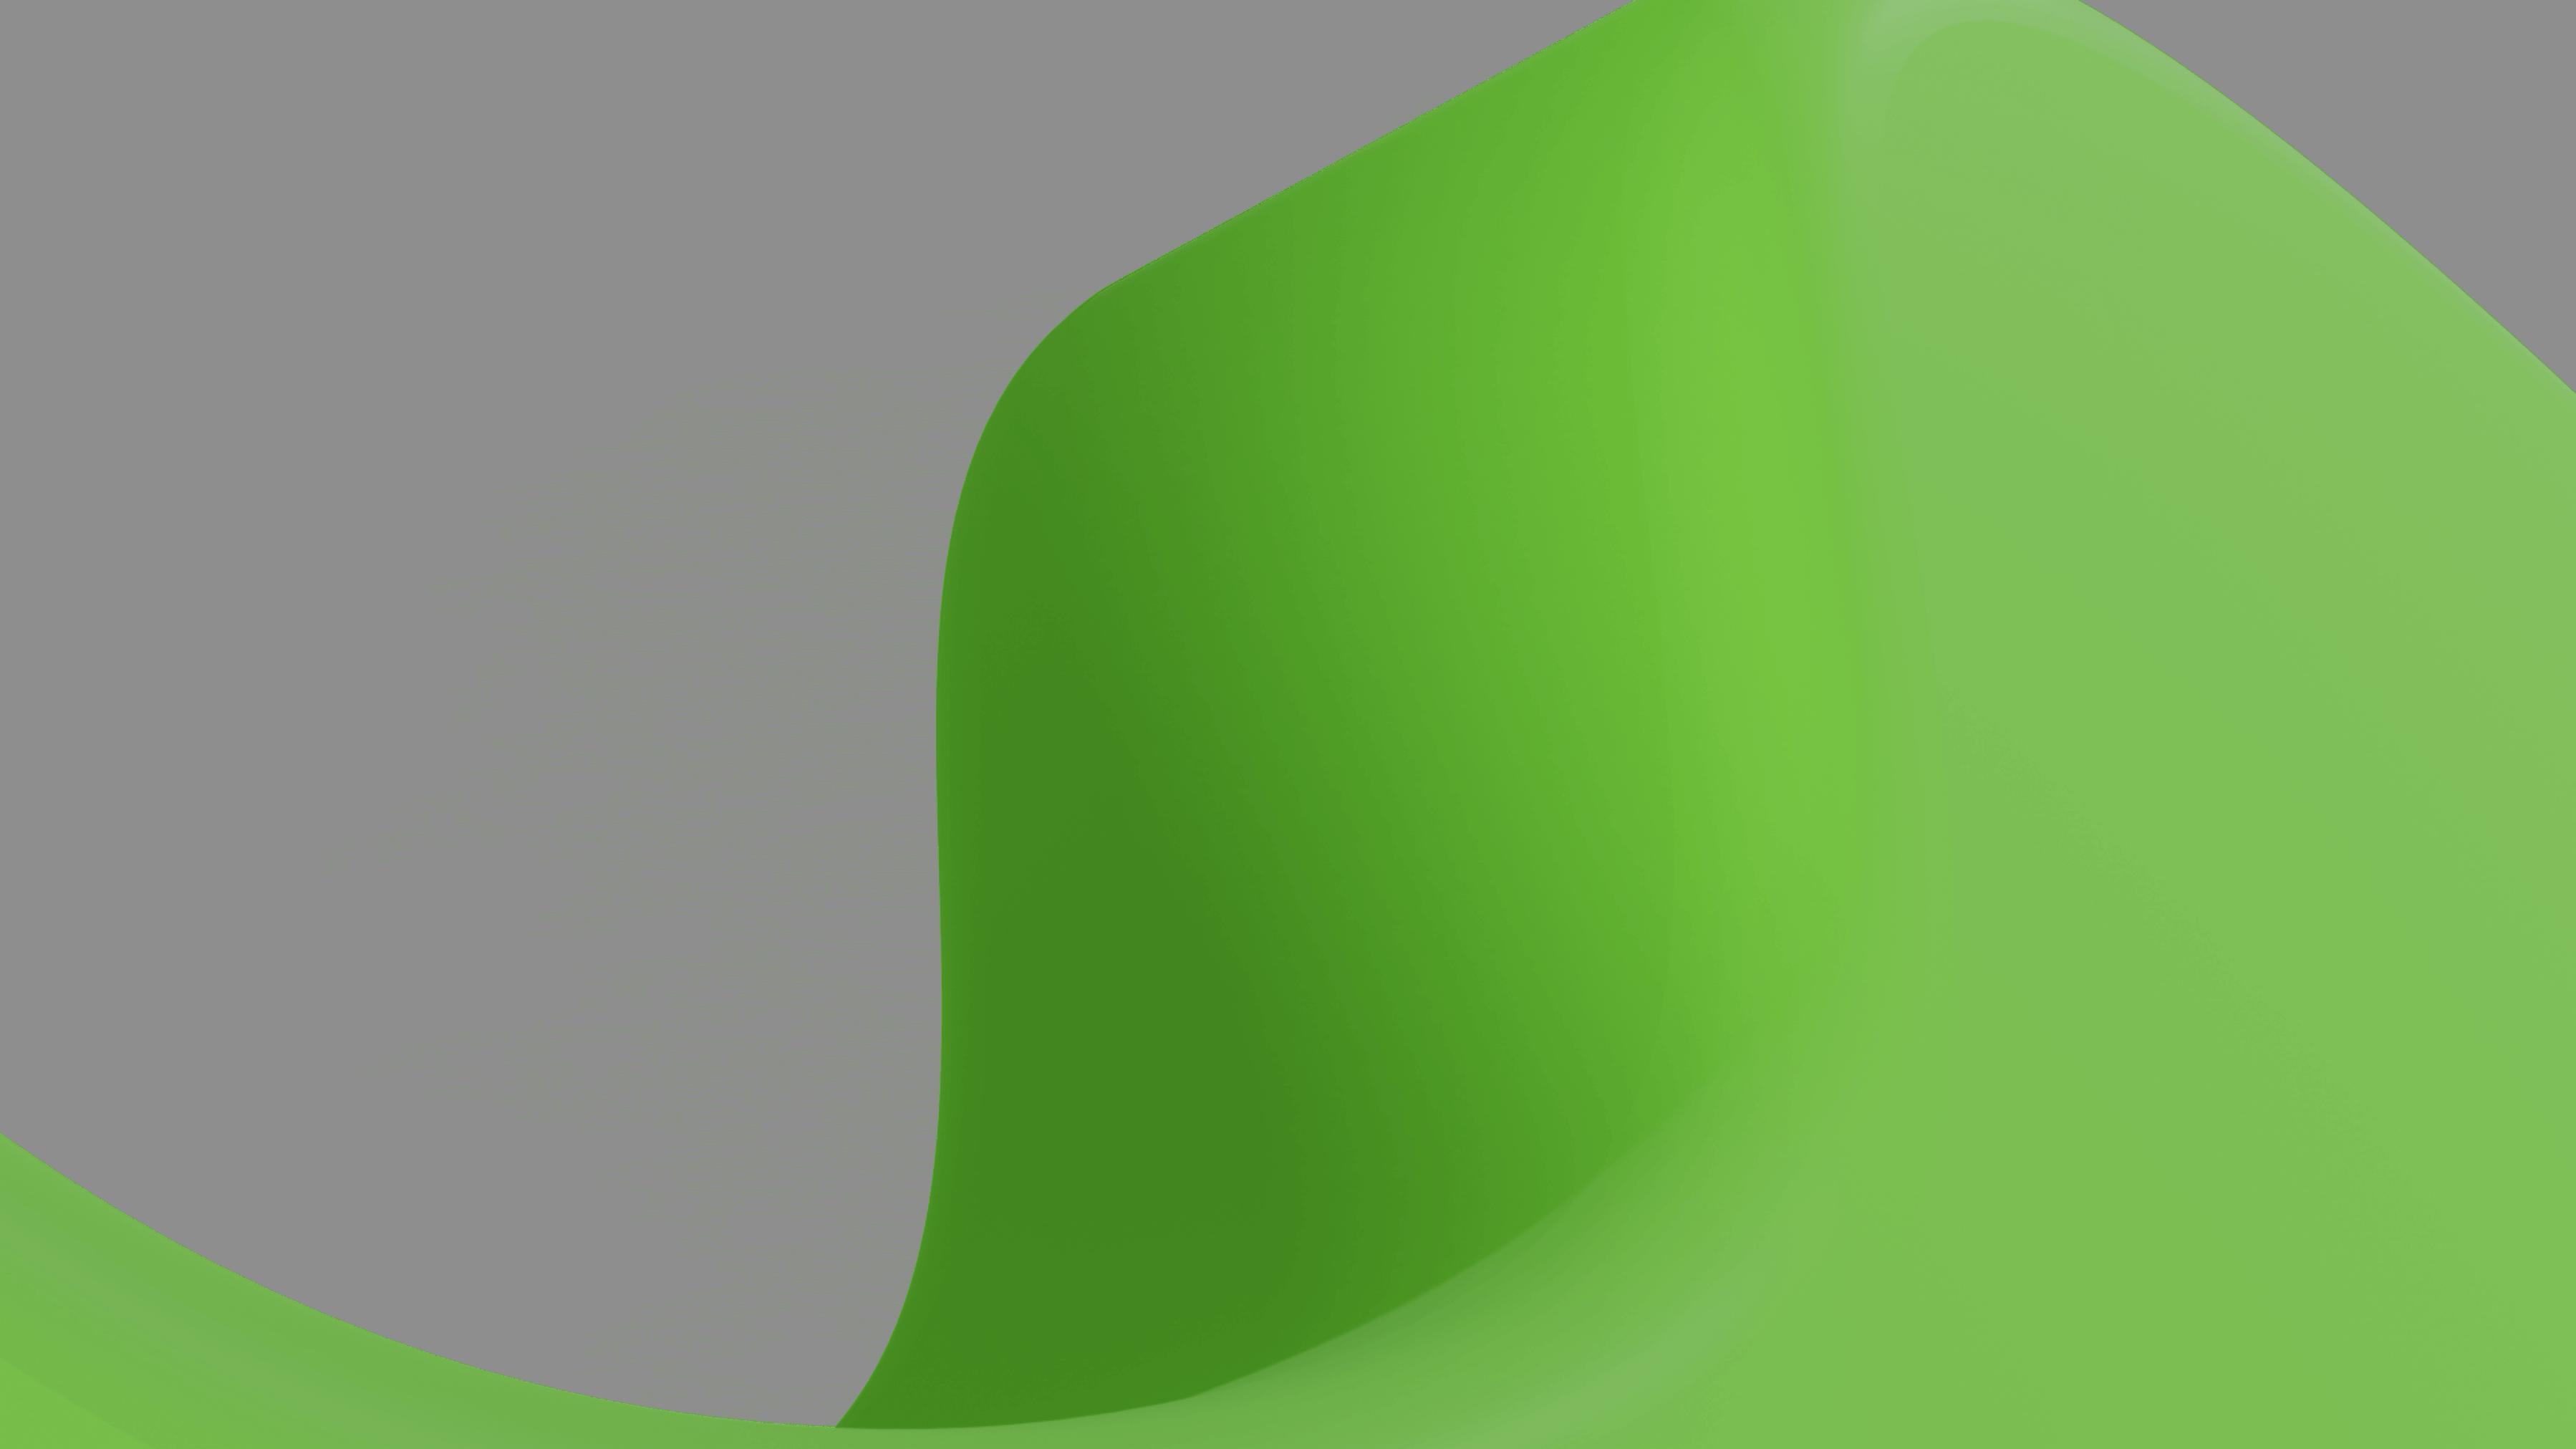 Aire Logic 3D Cog base image